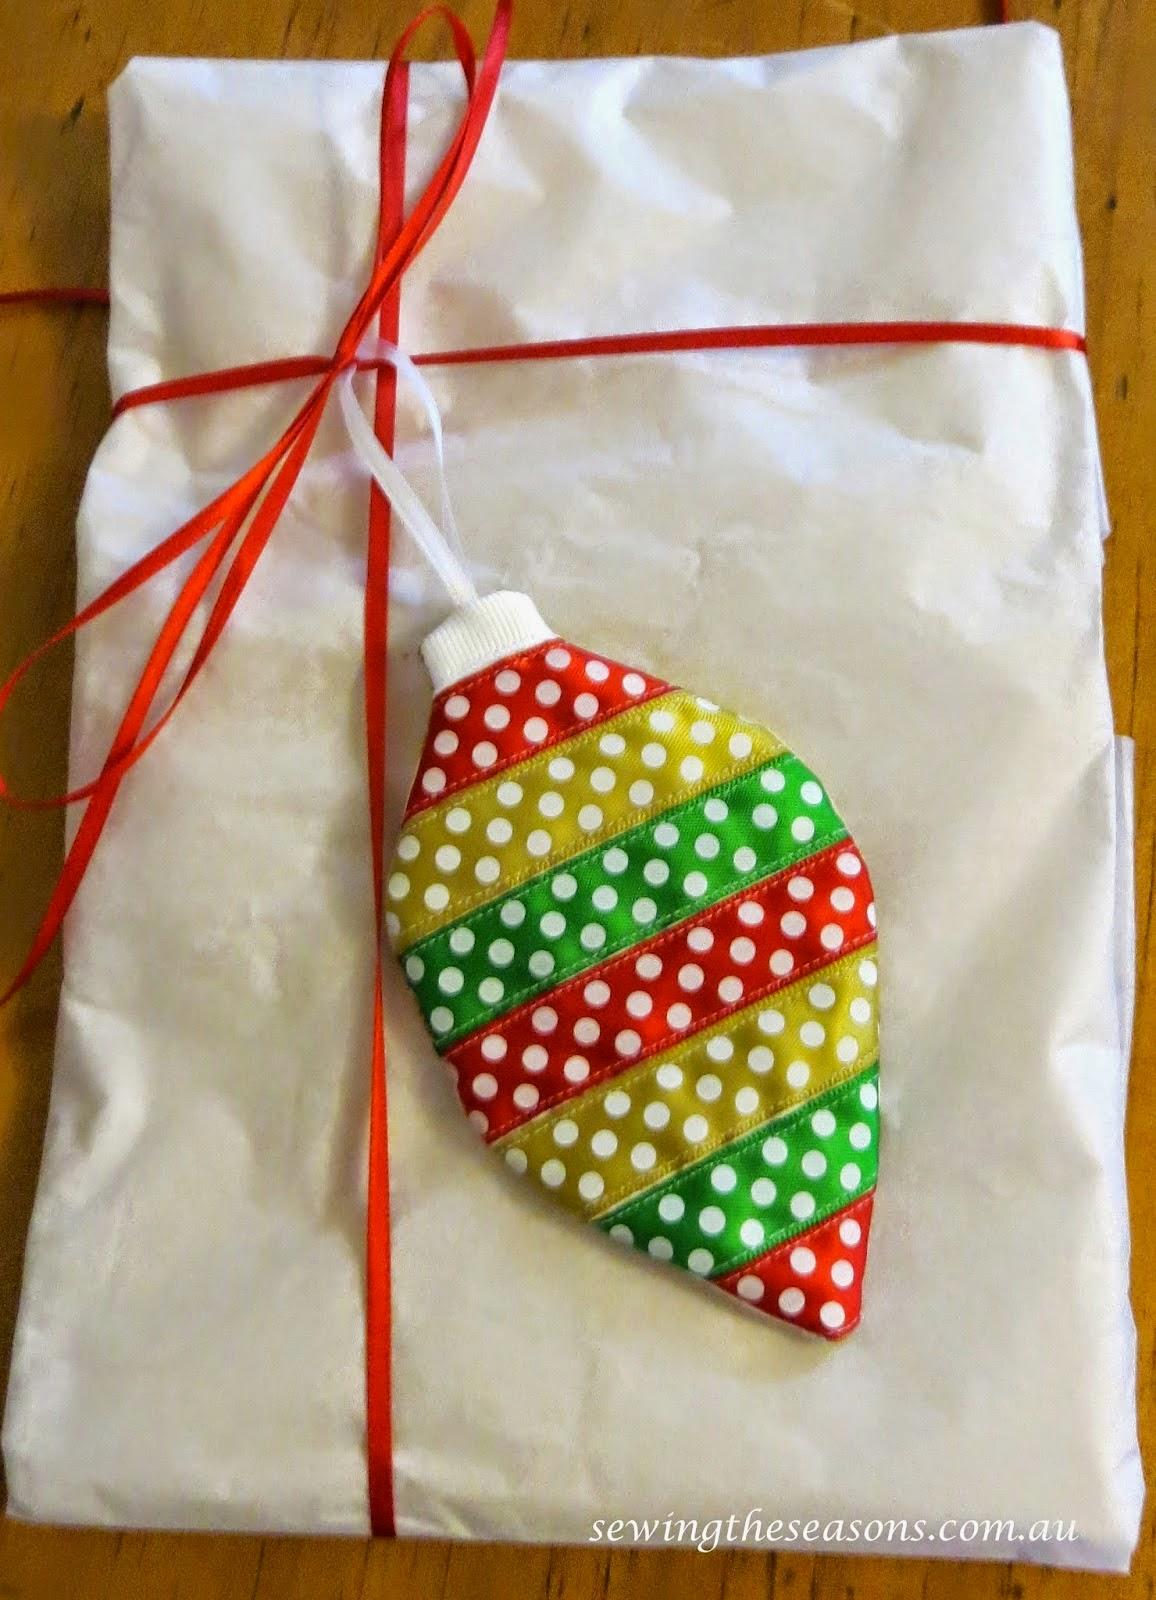 http://www.sewingtheseasons.com.au/2014/11/christmas-ribbon-decorations.html